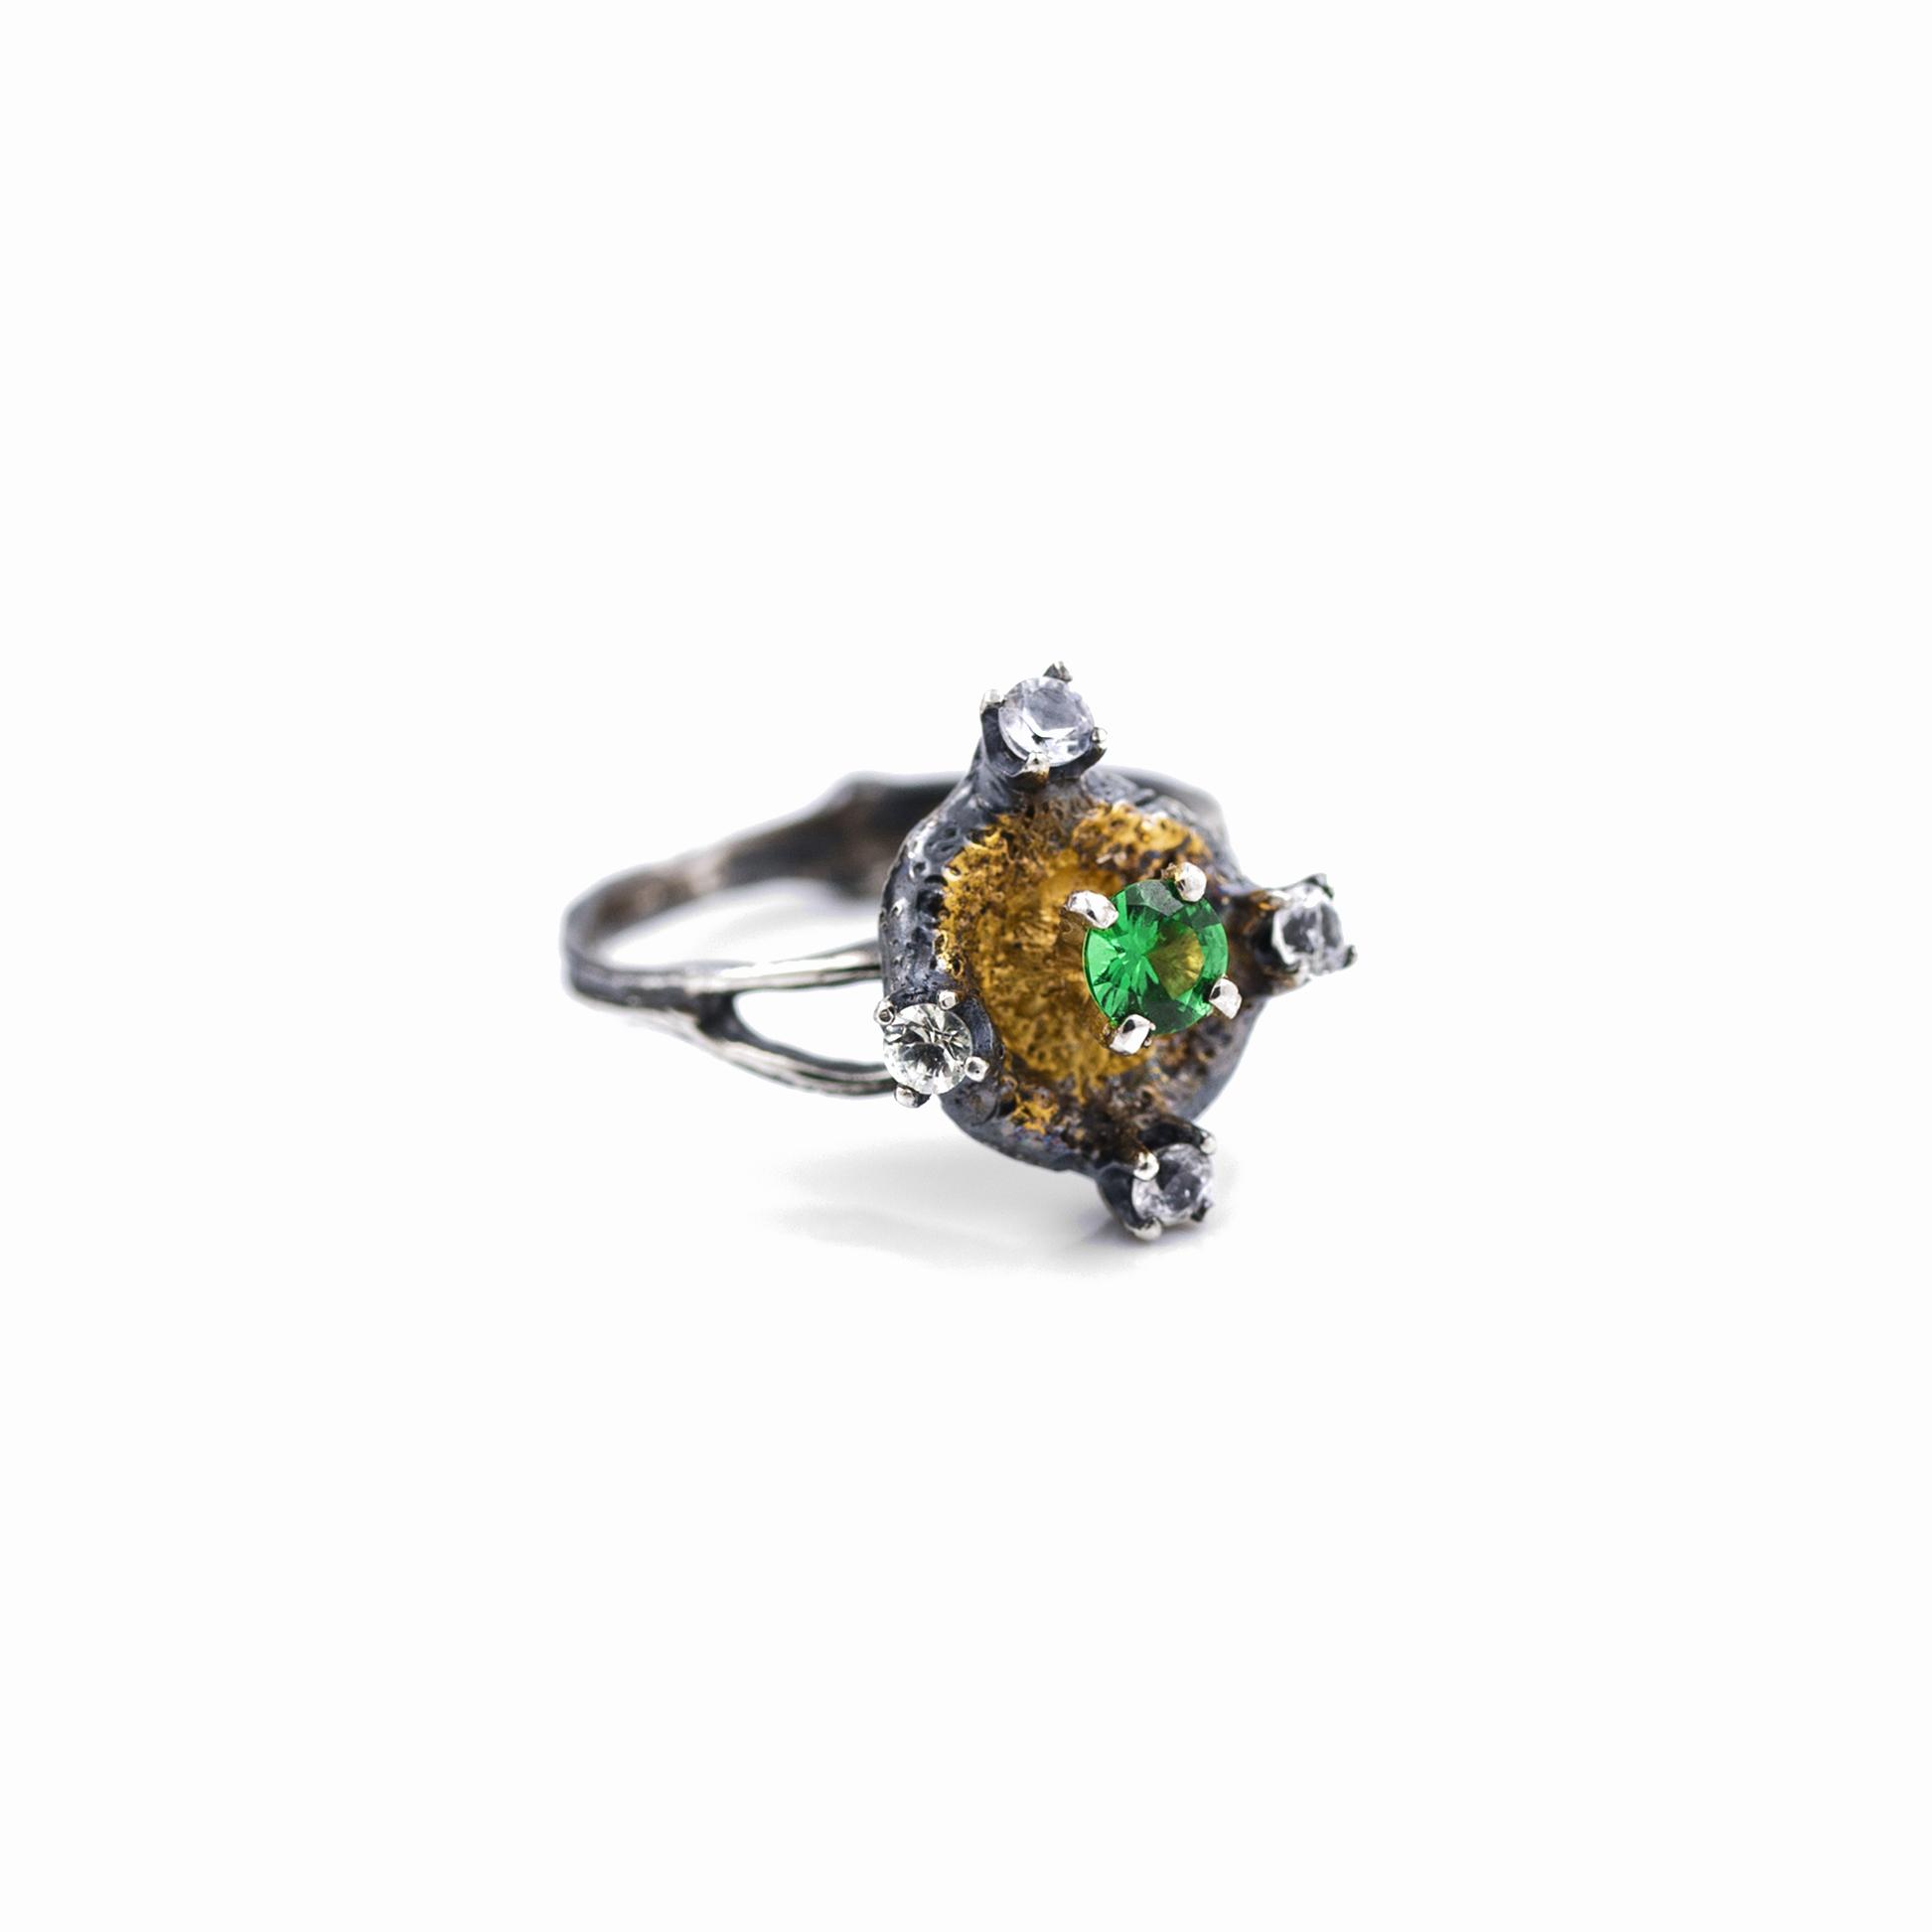 Fluorophore Ring :Sterling silver, tsavorite, sapphires, gold vermeil, patina